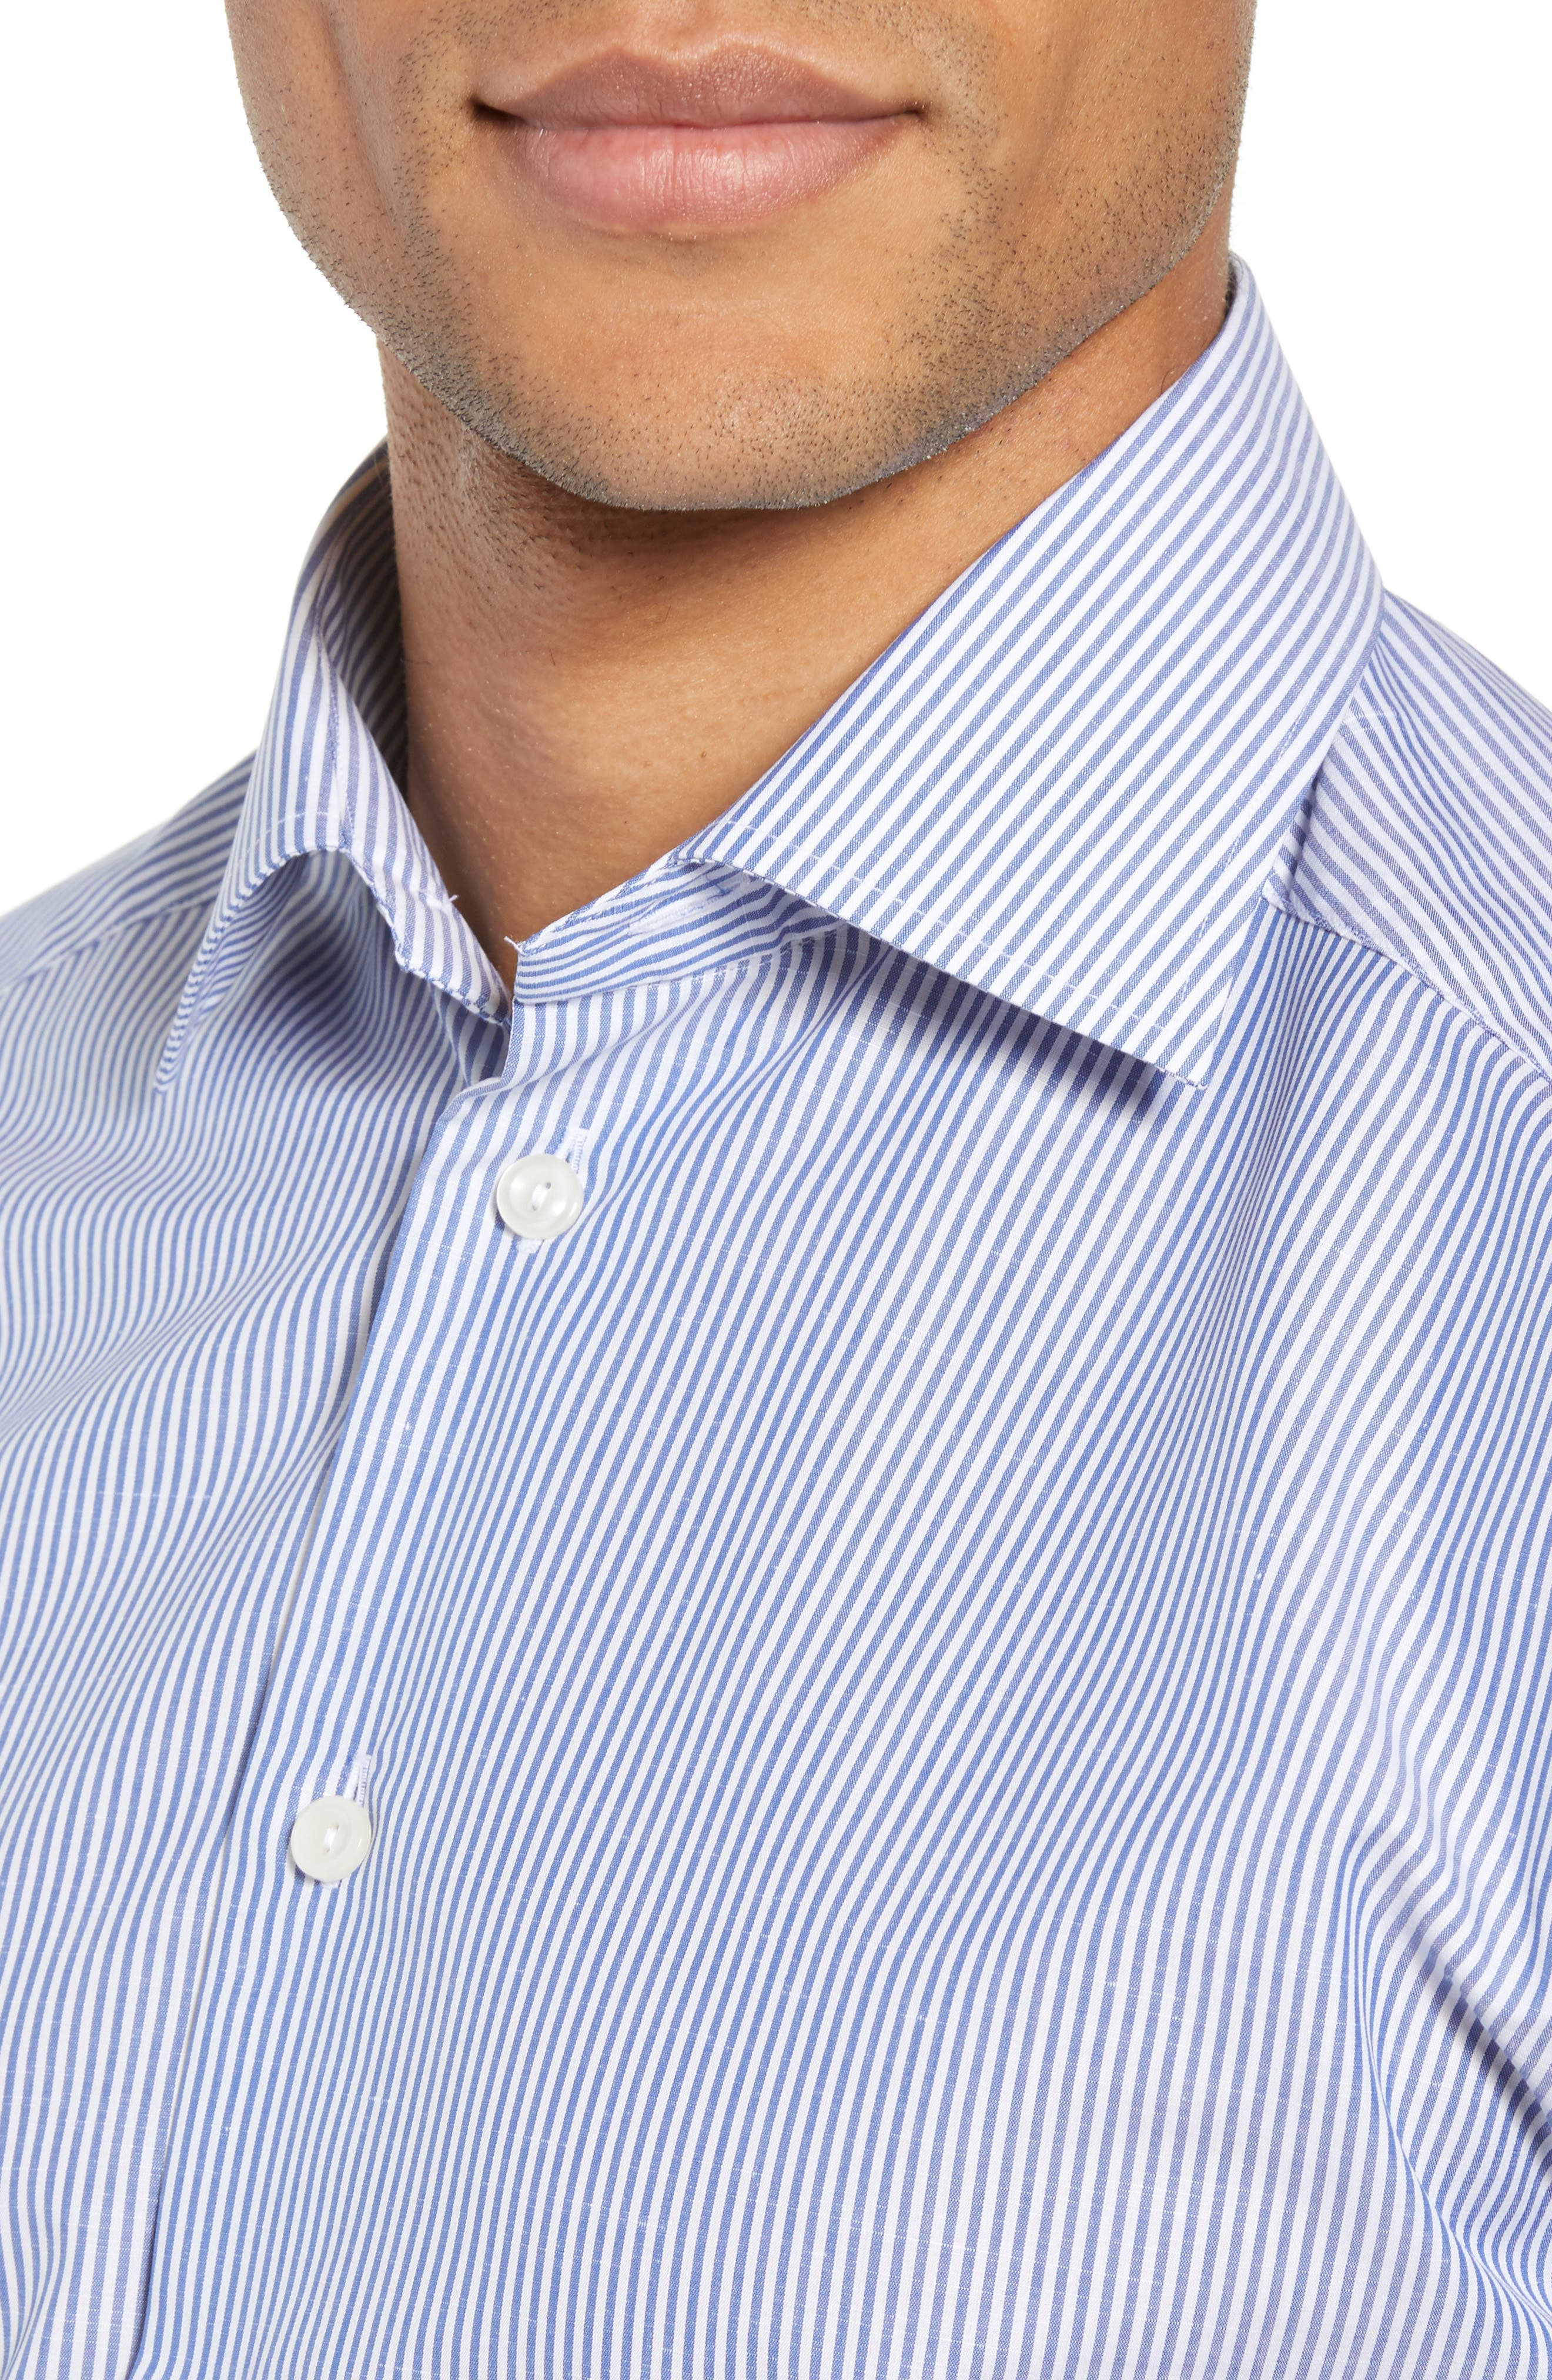 Slim Fit Stripe Dress Shirt,                             Alternate thumbnail 2, color,